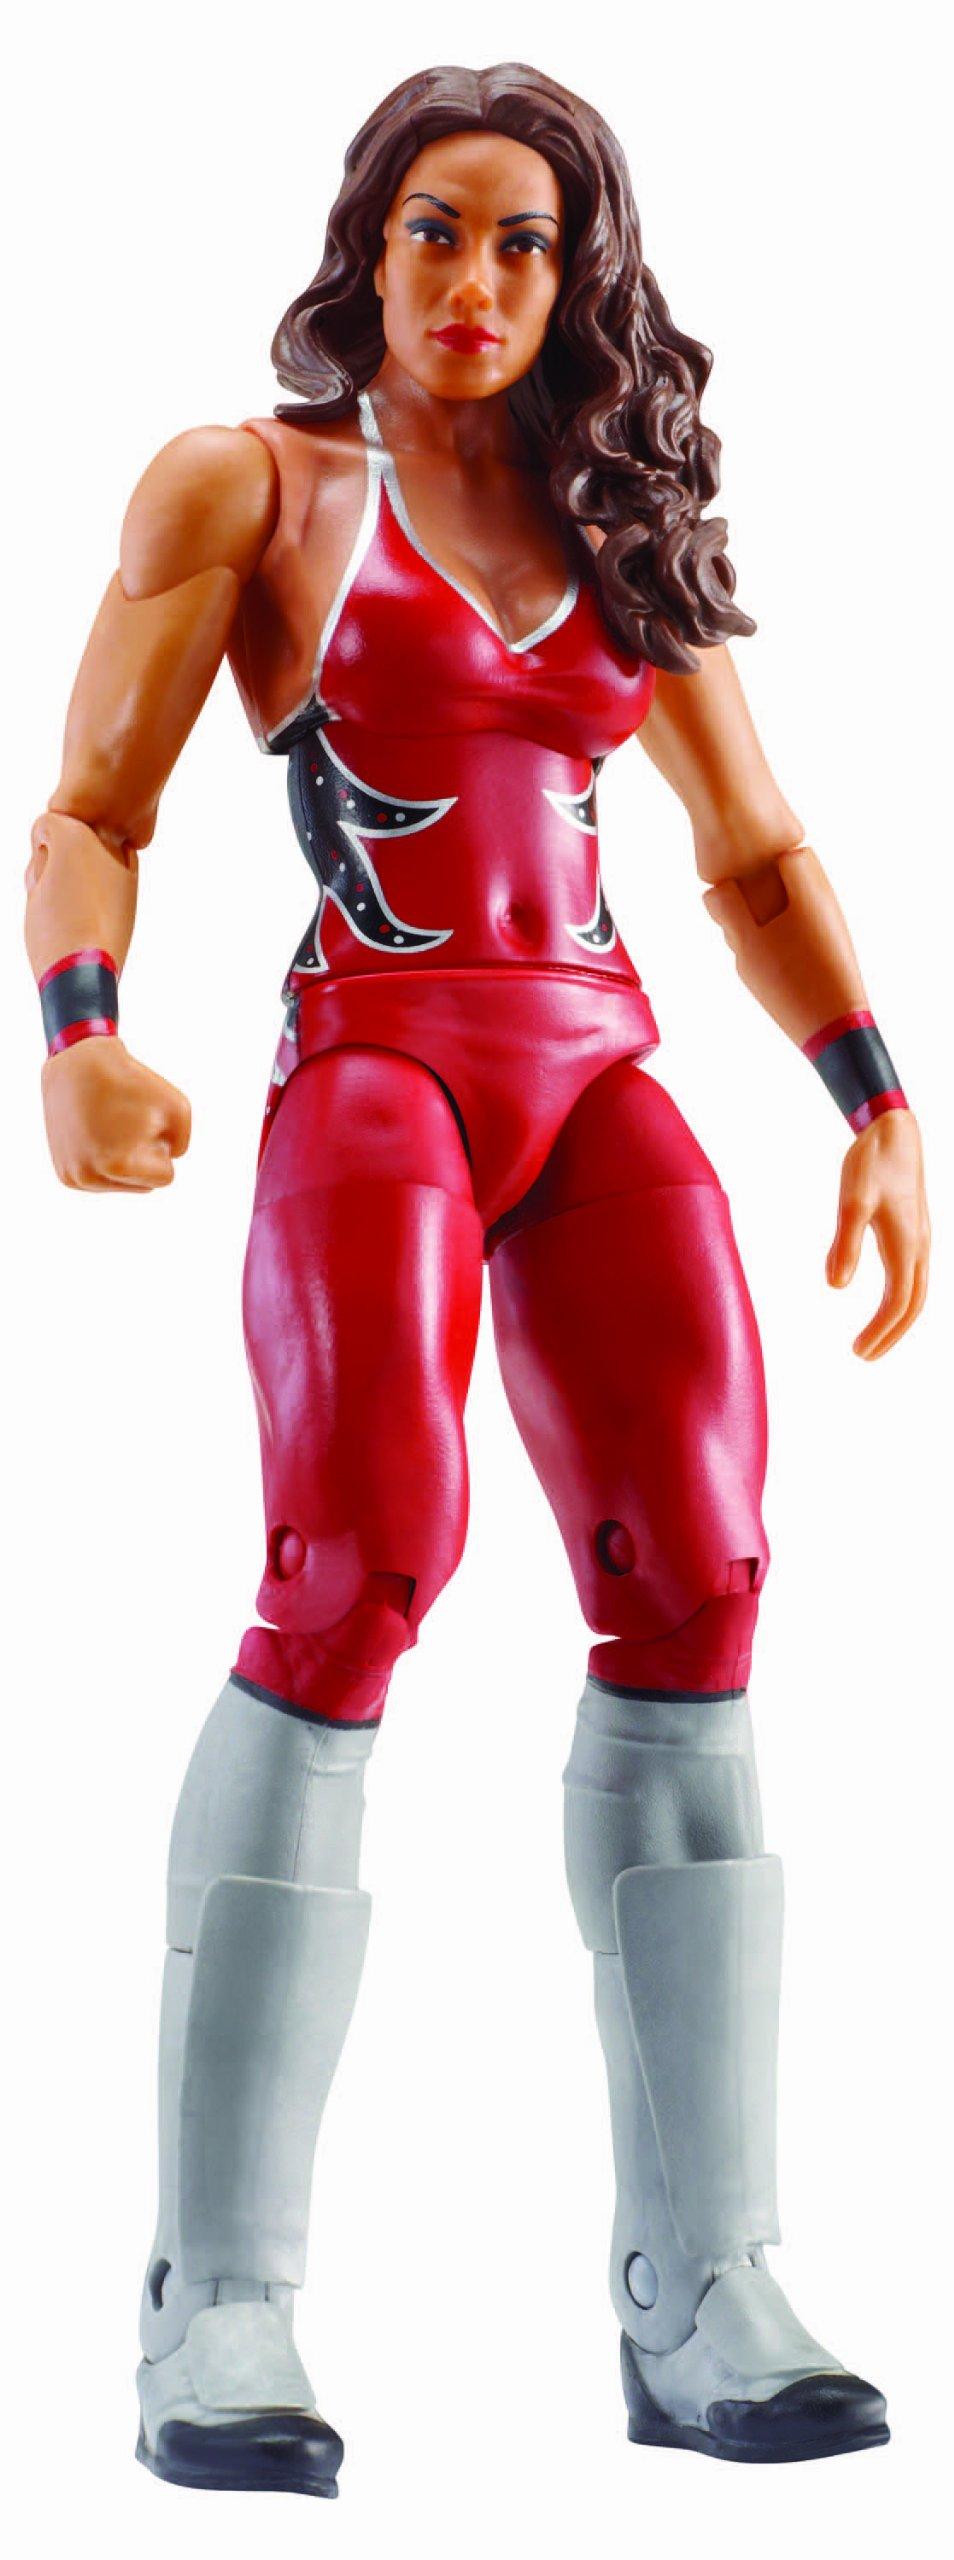 WWE Series 33 - Superstar #59 Tamina Snuka Figure by WWE